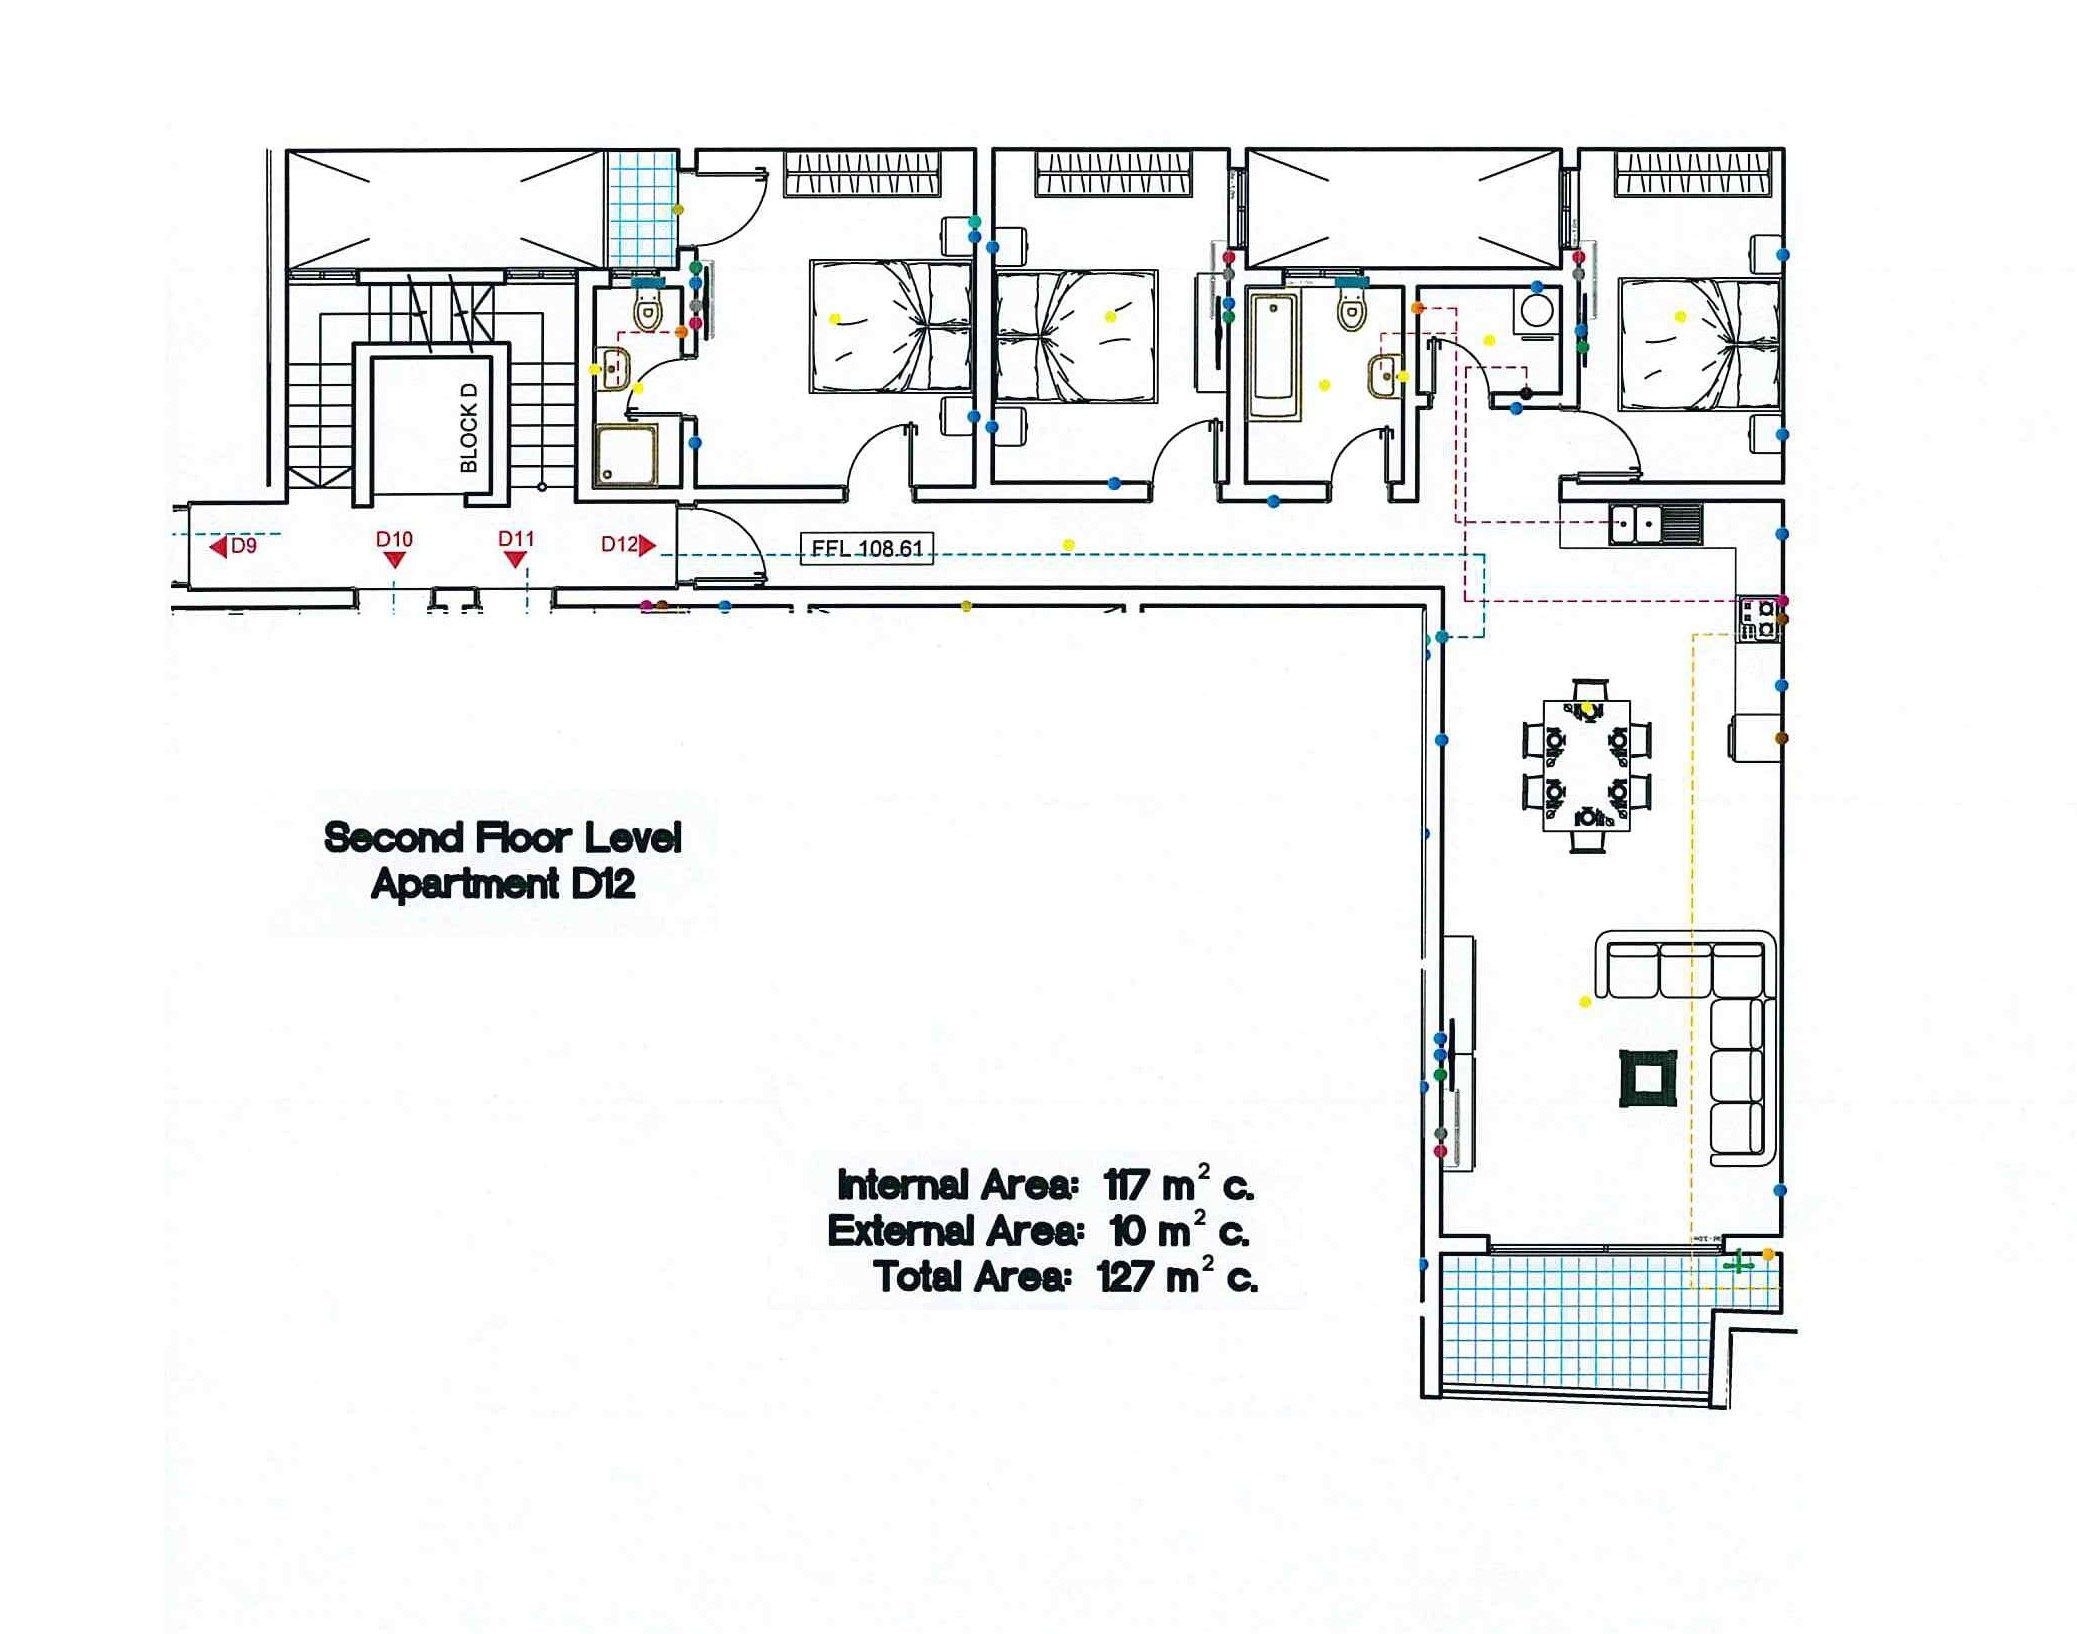 Block D - Second Floor D12